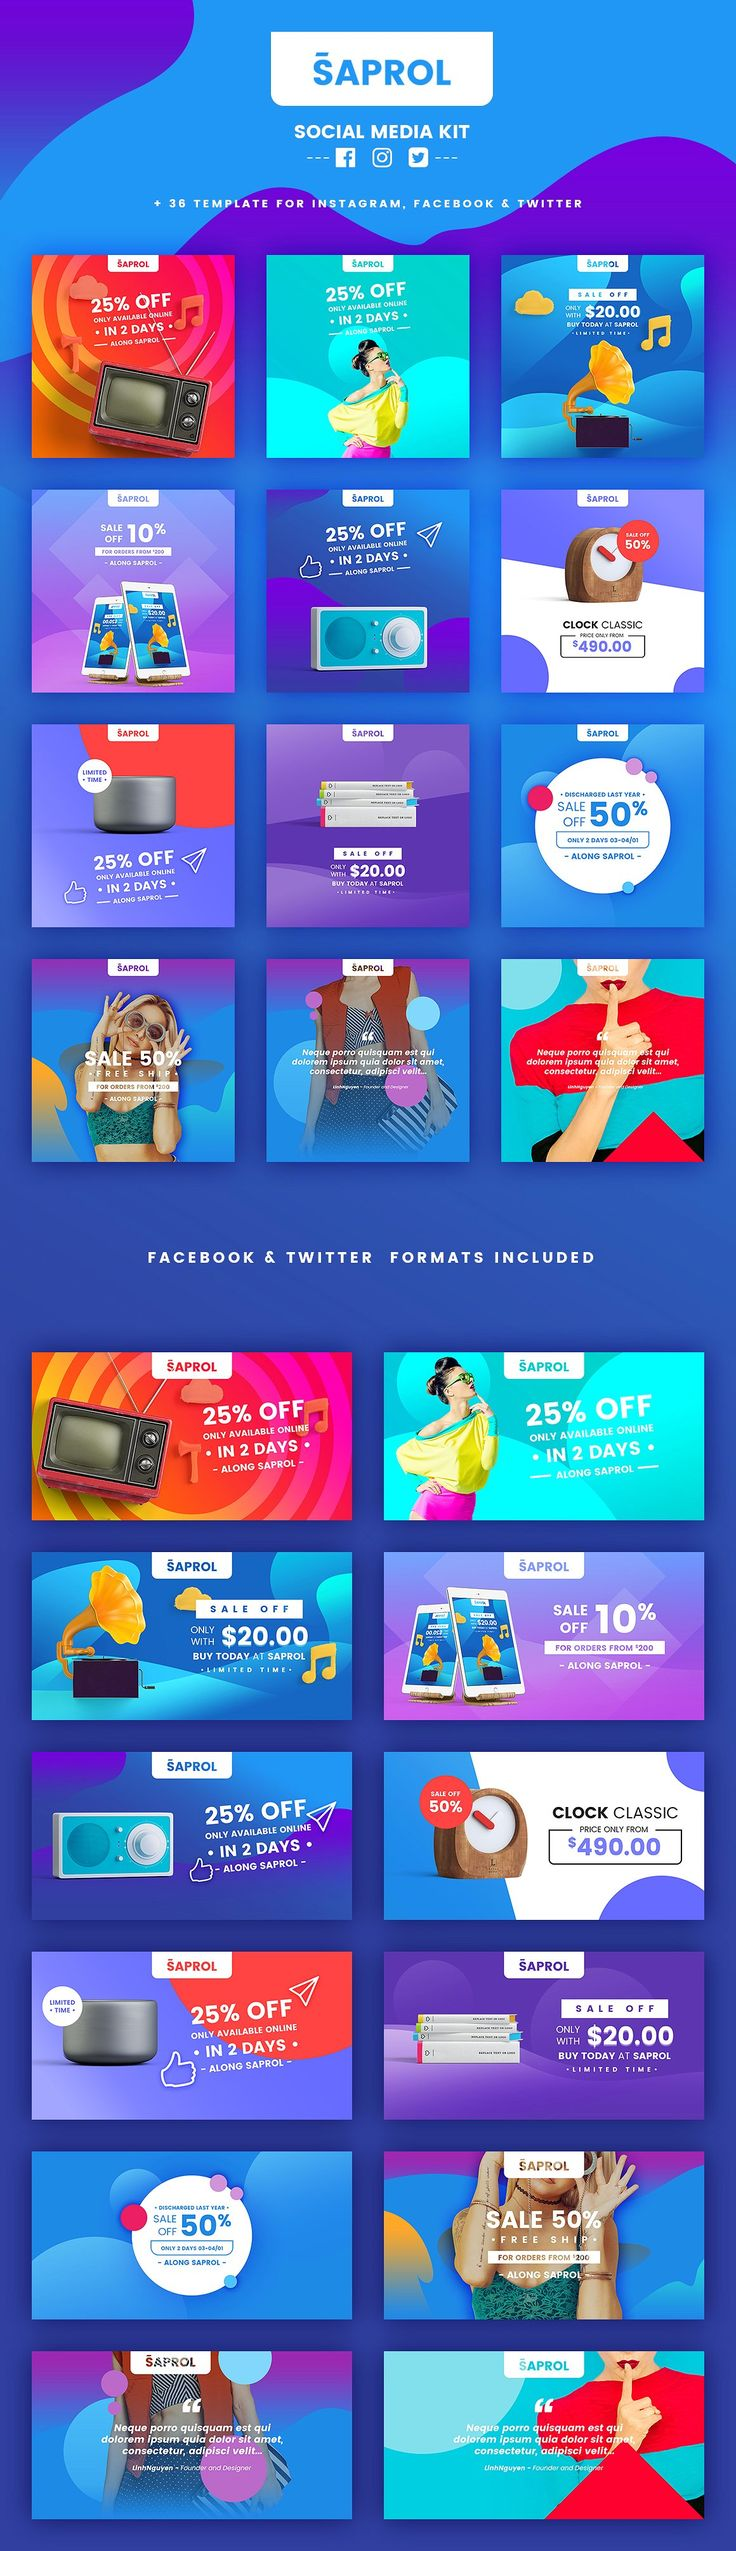 Saprol Social Media Kit by BazicLab on @creativemarket